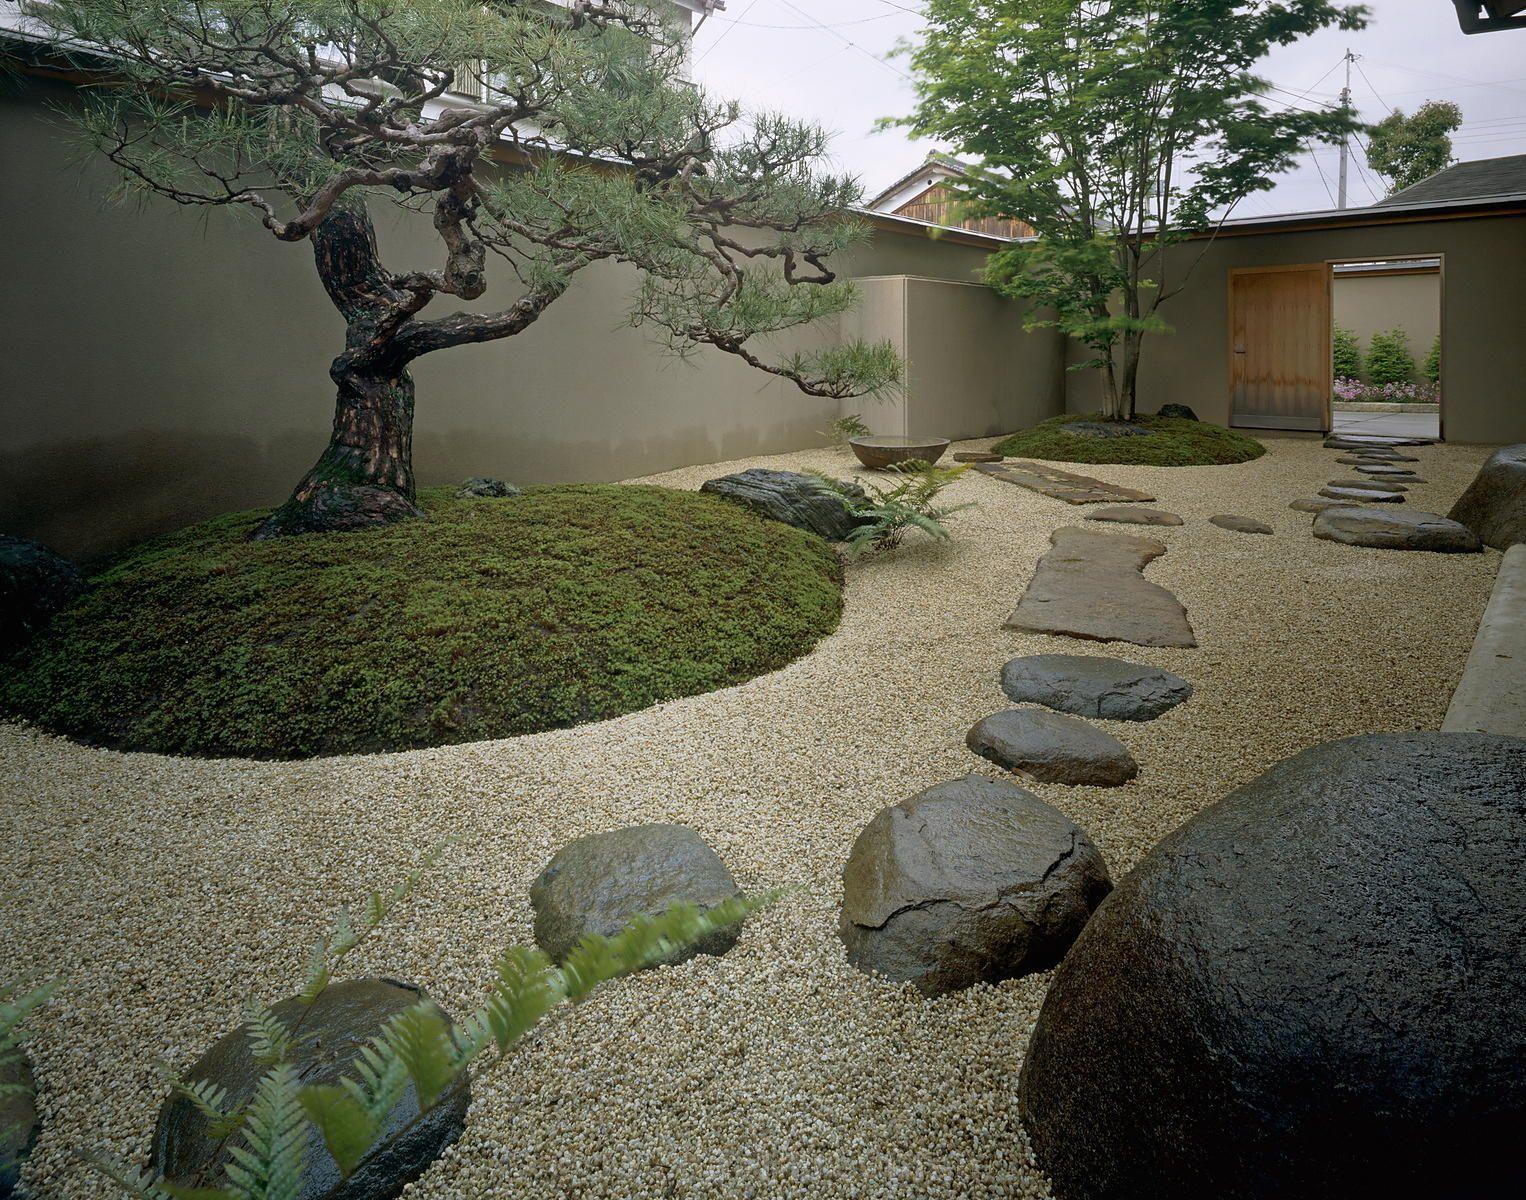 pin de luis cardona en jardines pinterest garten landschaftsarchitektur y zen. Black Bedroom Furniture Sets. Home Design Ideas